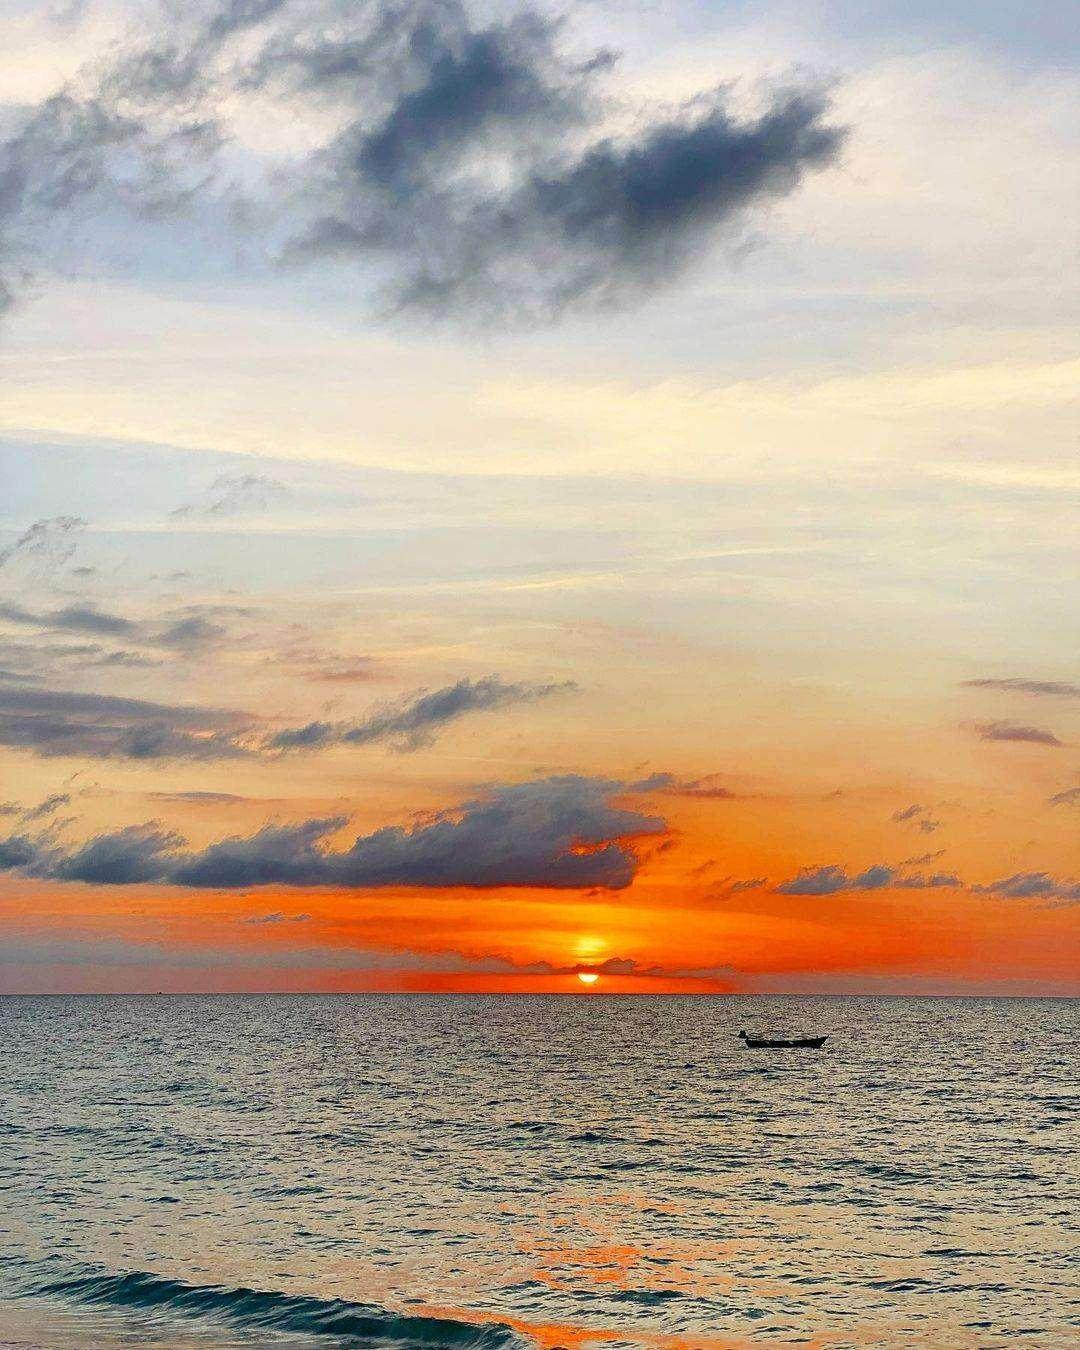 Zonsondergang boven Nai Thon Beach op Phuket, Thailand